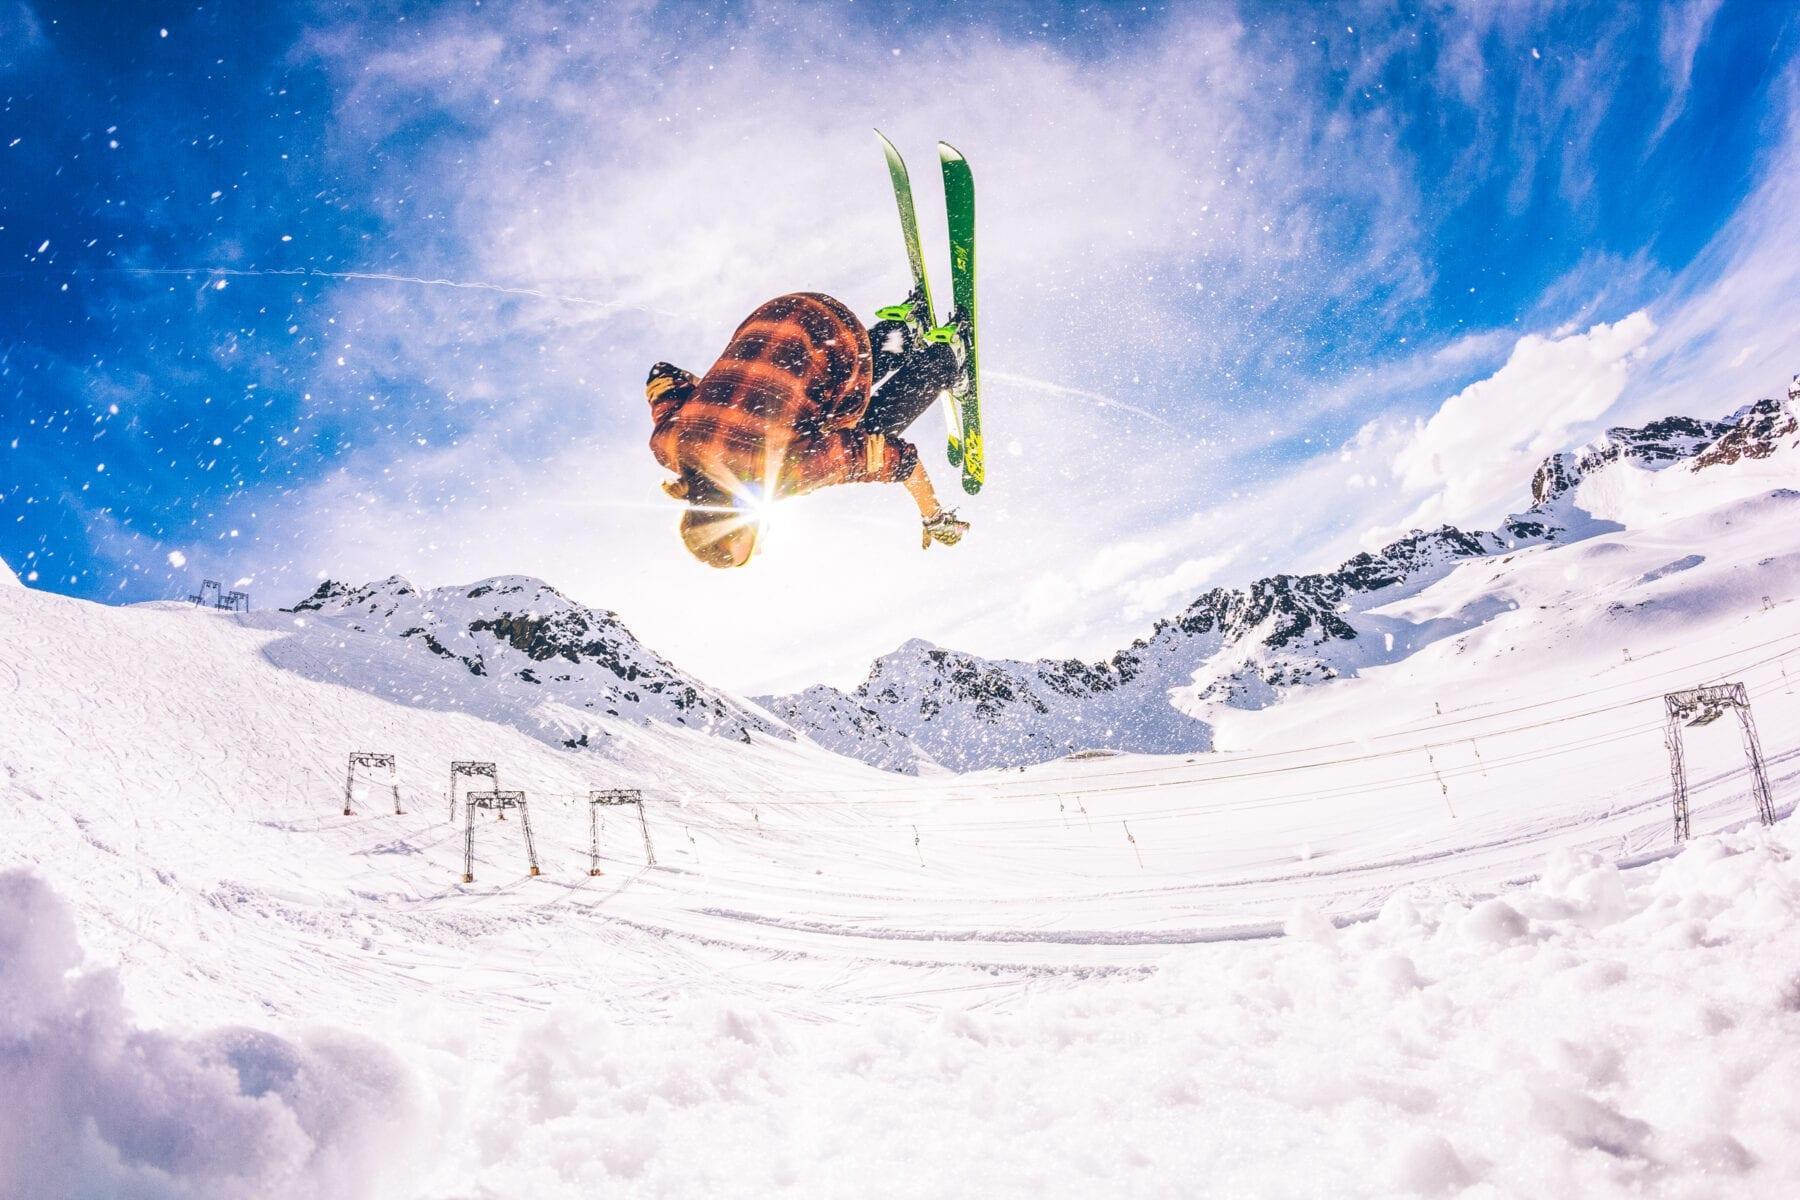 wintersport funpark regels stunt